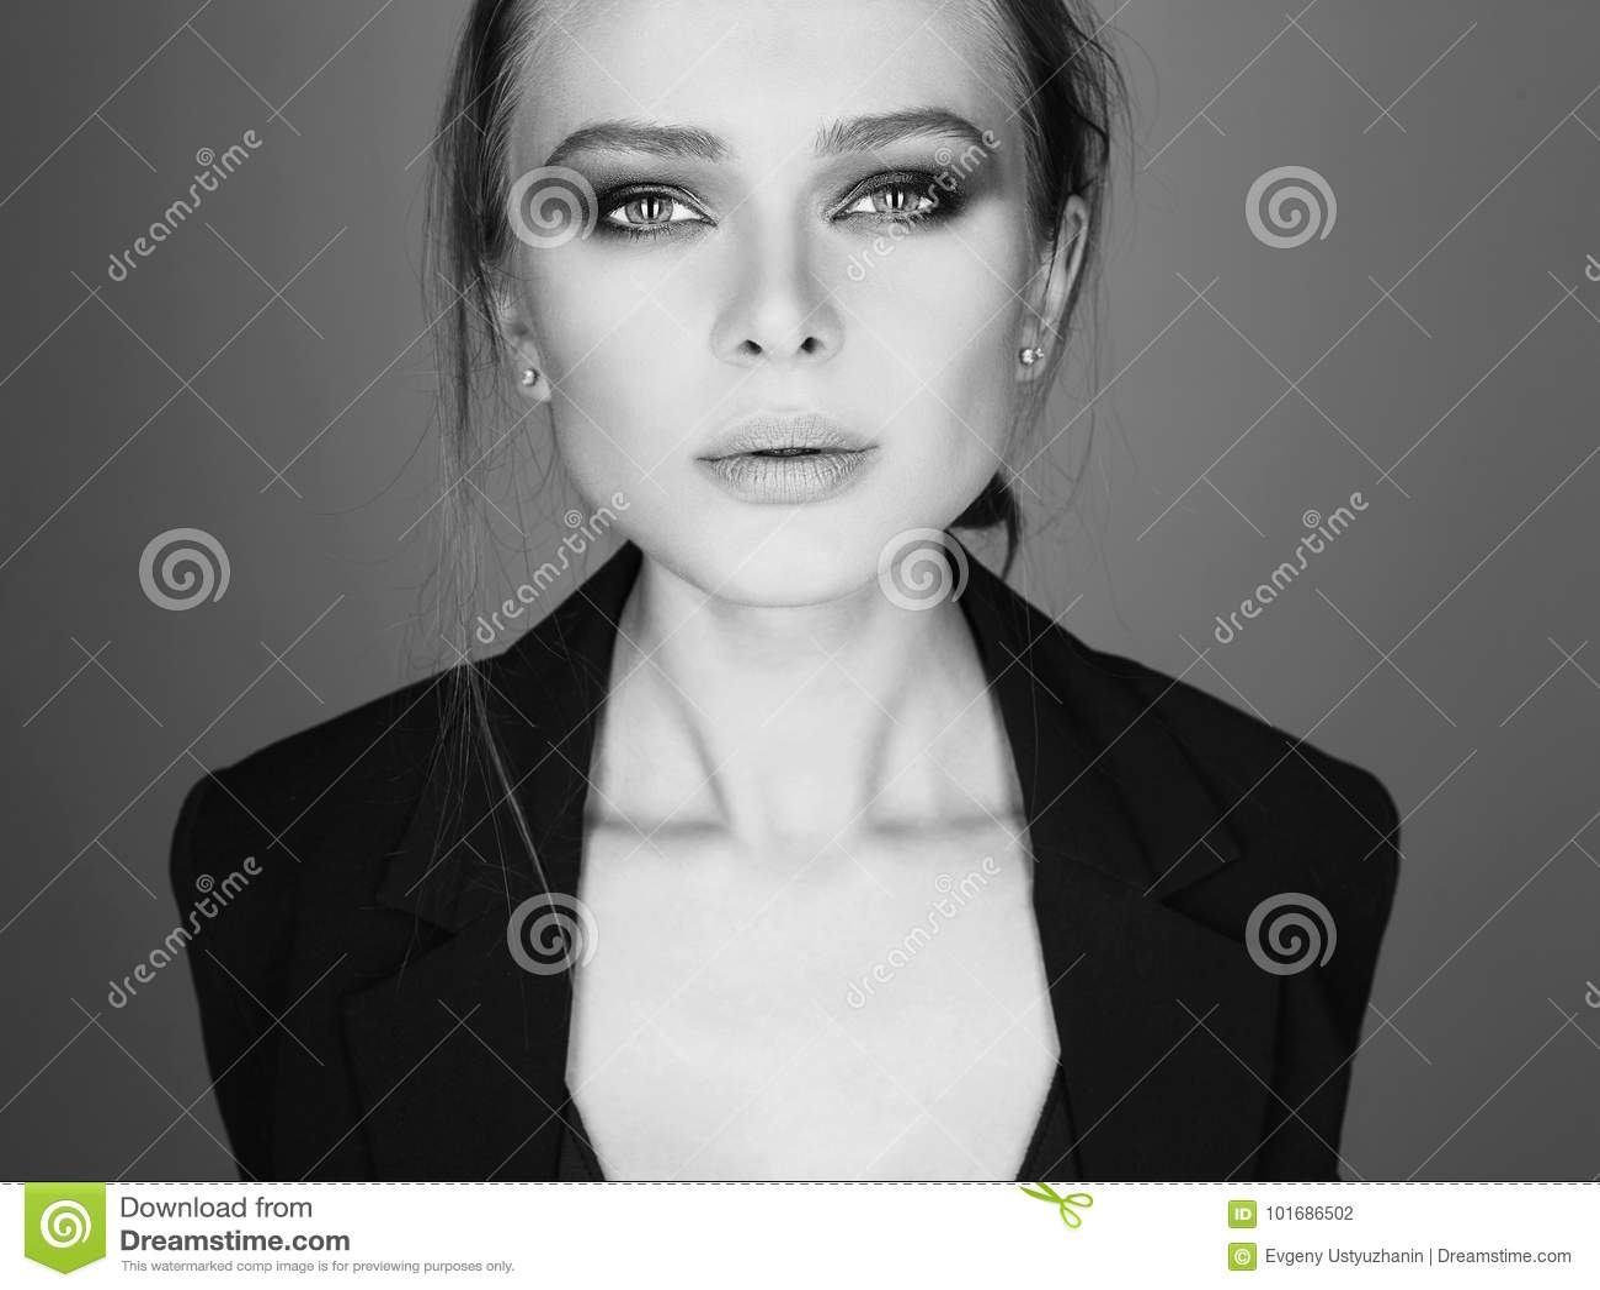 Beautiful woman sensual model girl black and white fashion portrait